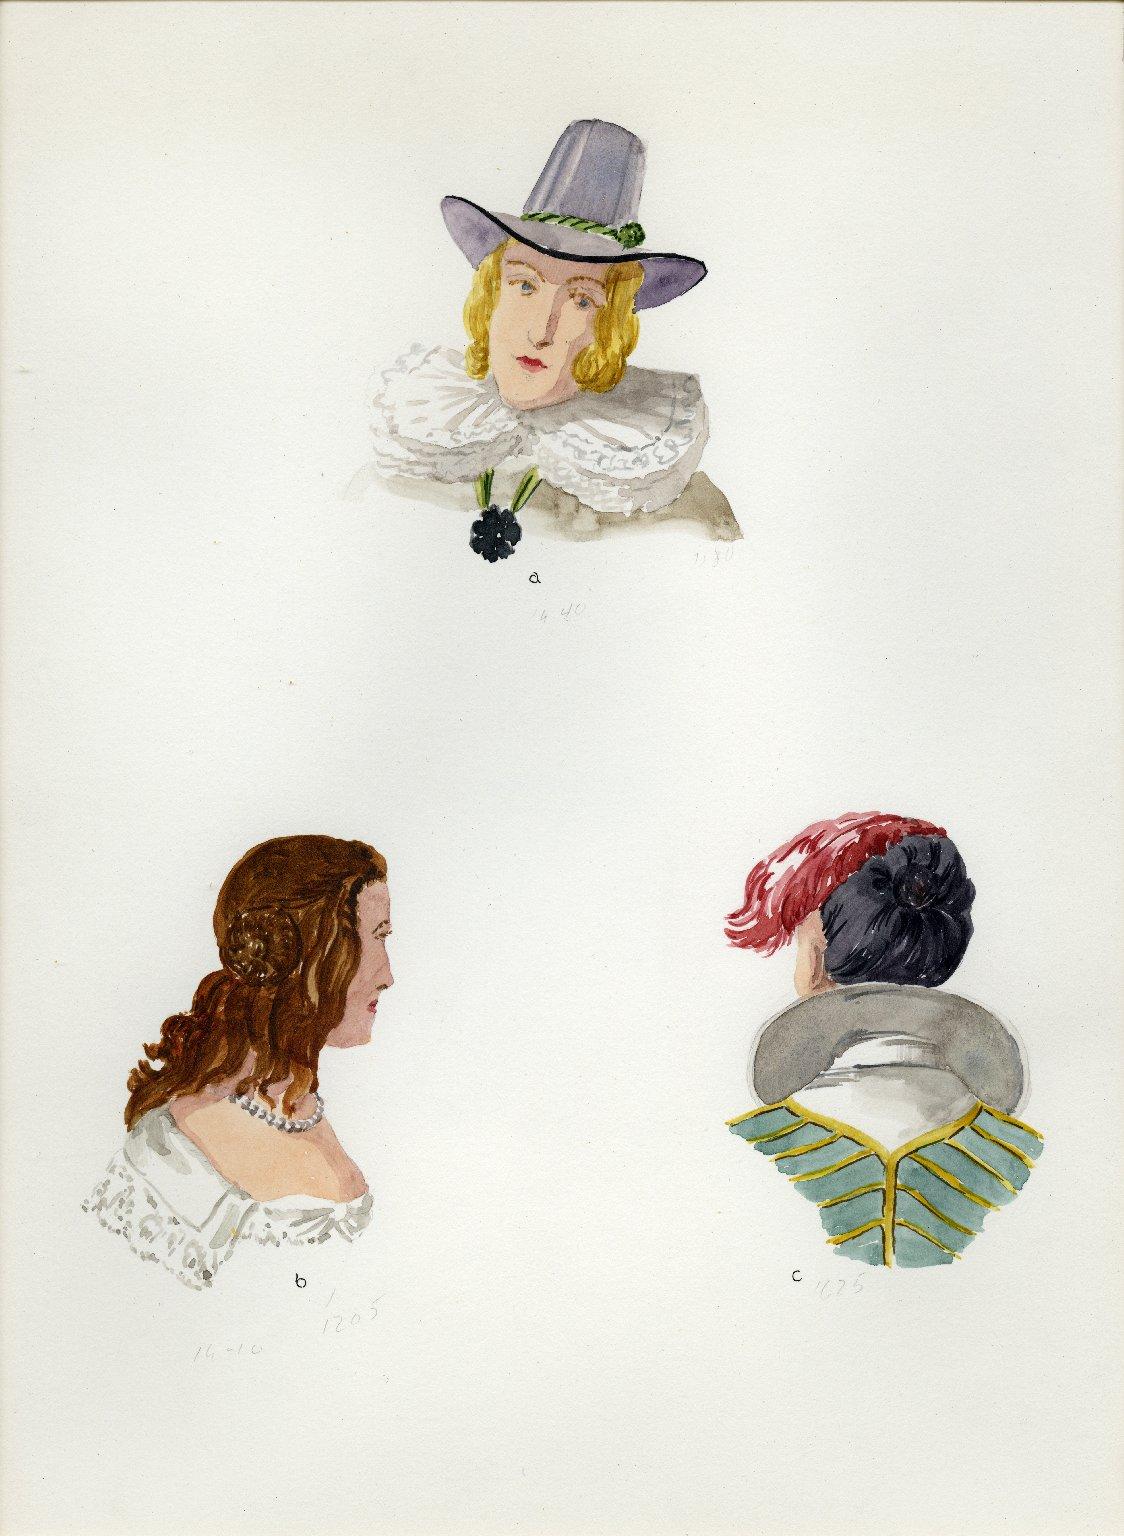 Plate VI: 17th Century English hat, coiffures